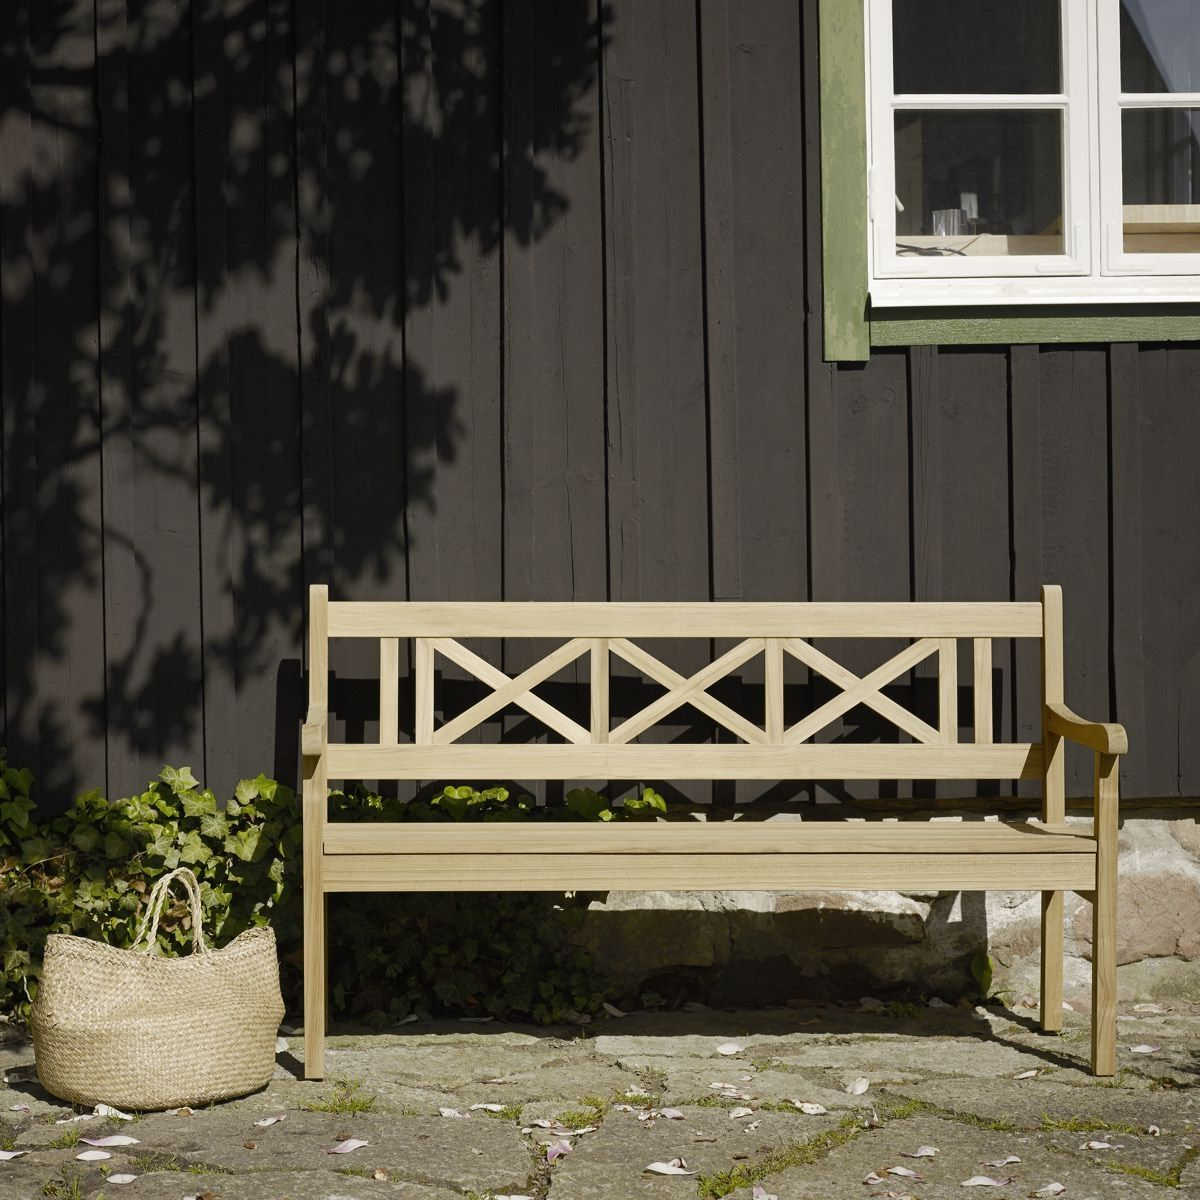 Skagerak Skagen Bench in front of black weatherboard building